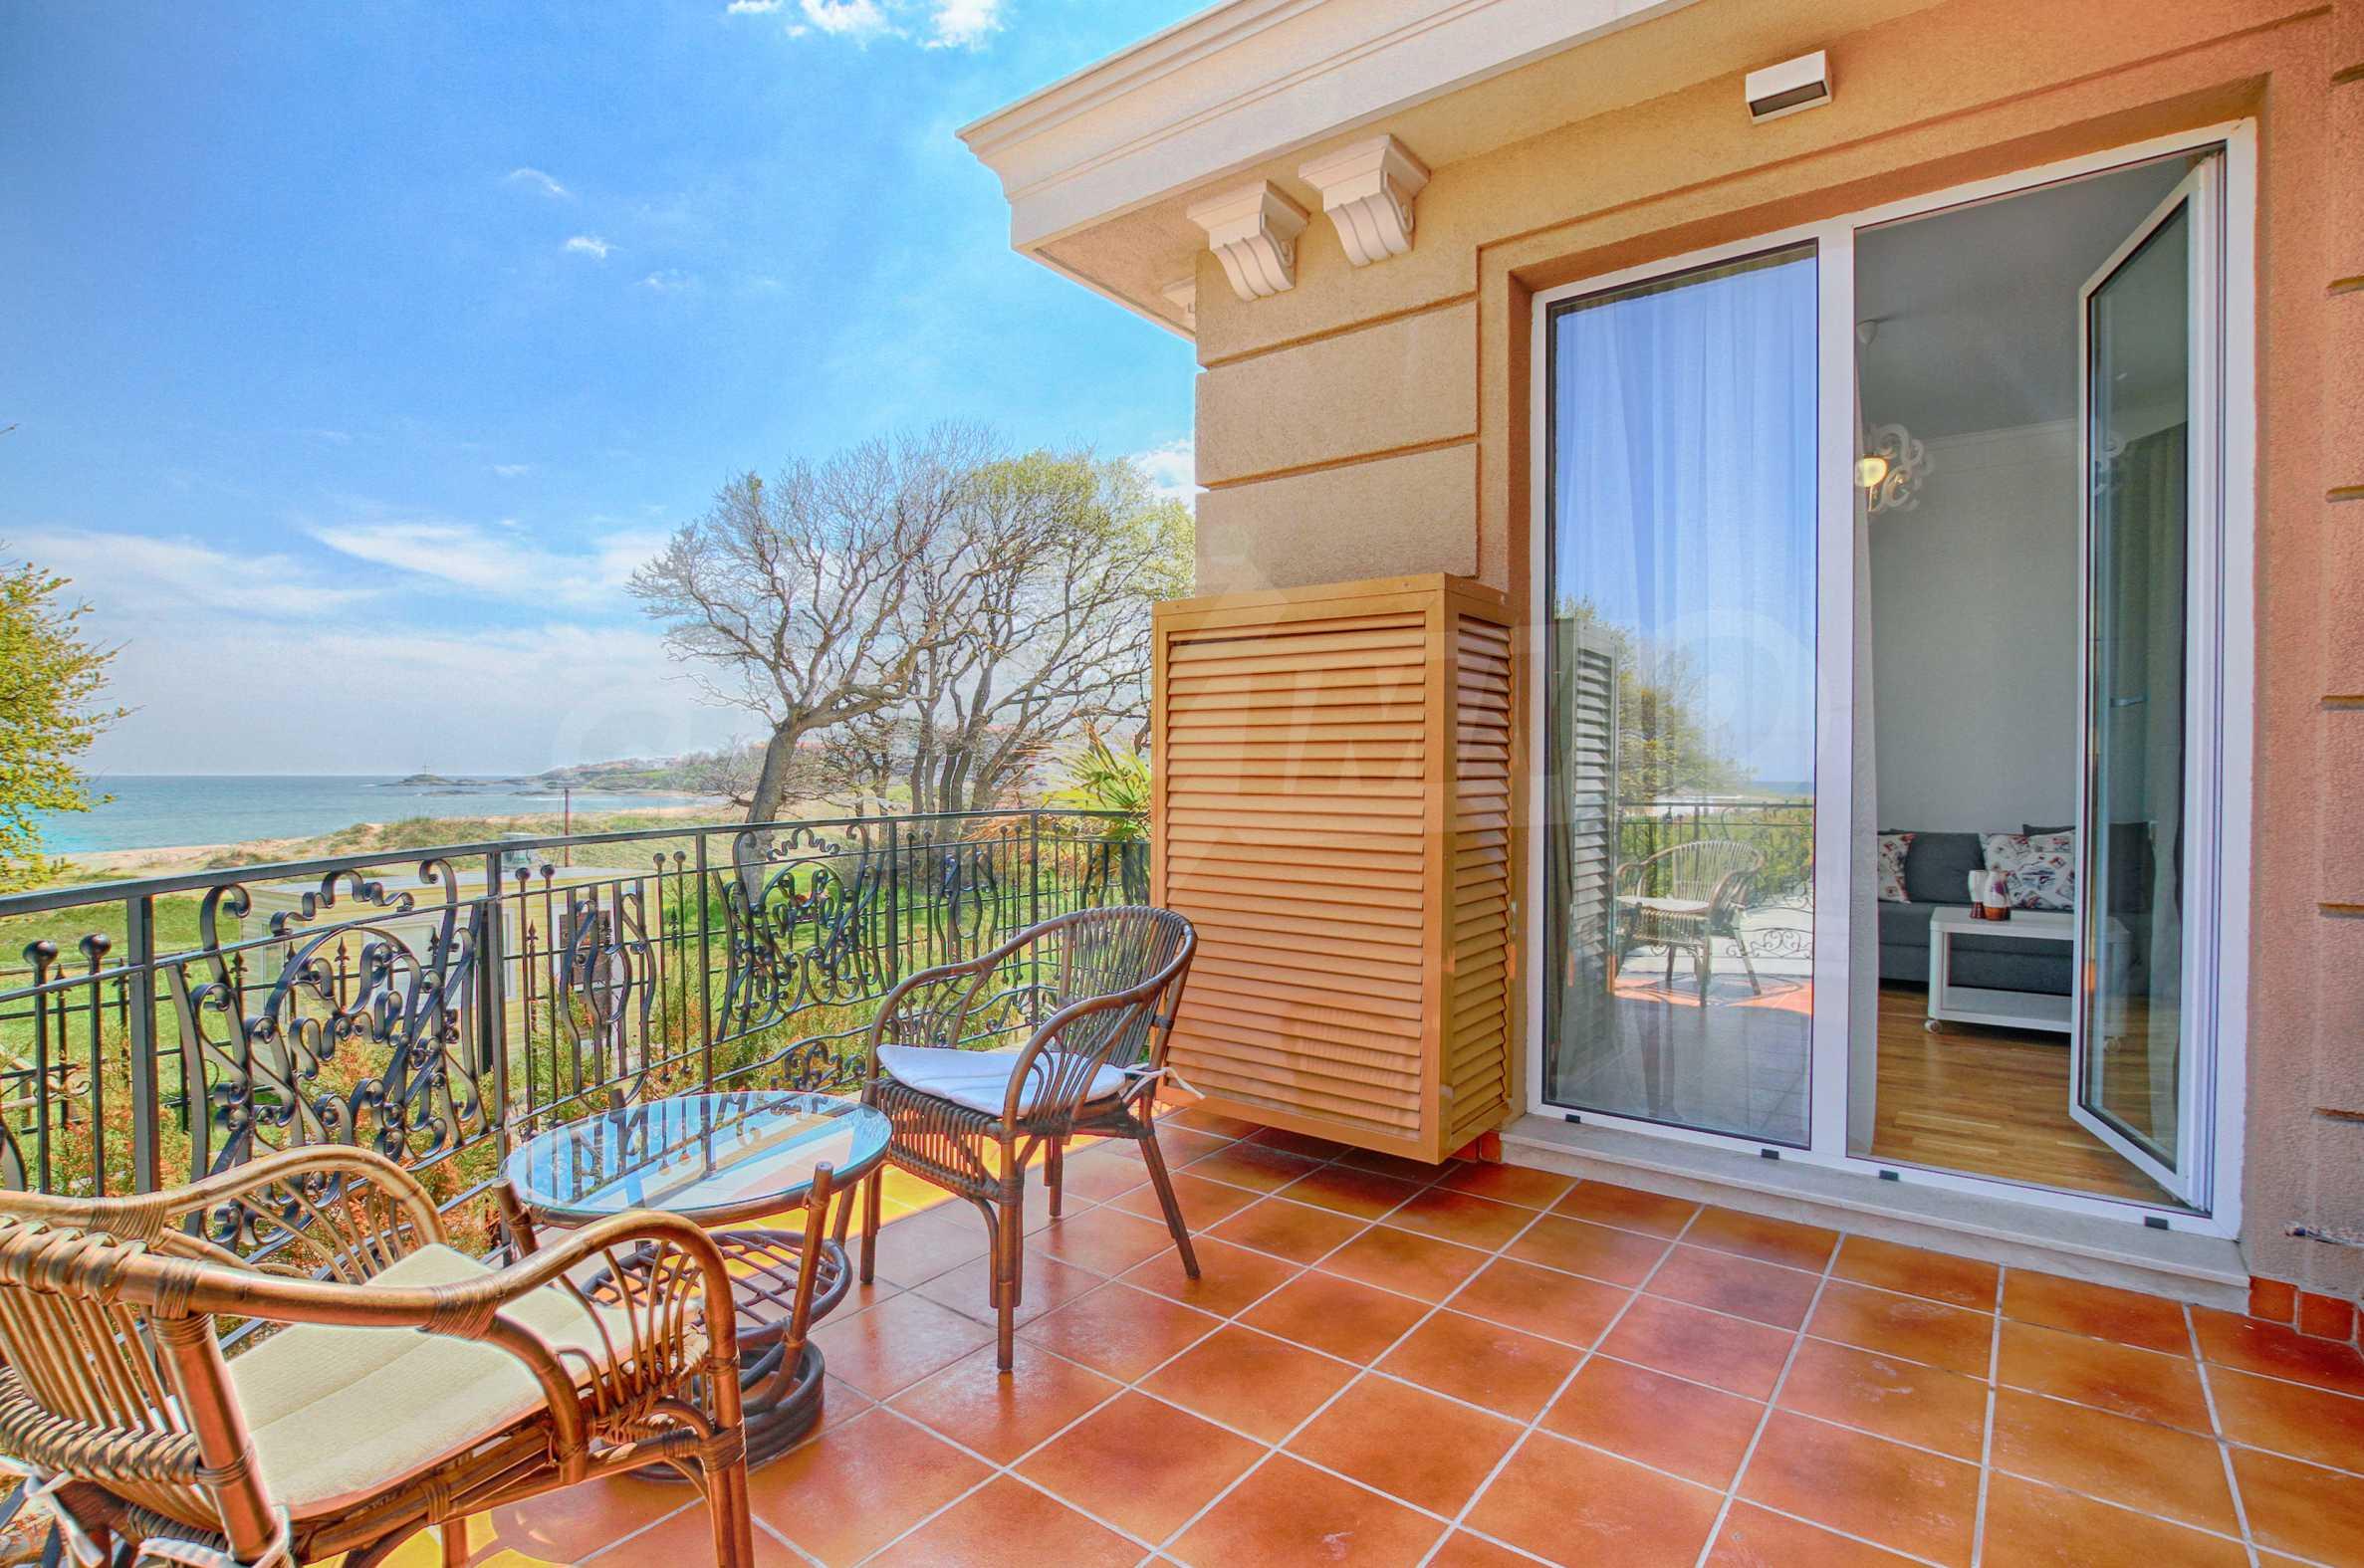 Стилен двустаен апартамент под наем в Belle Époque Beach Residence